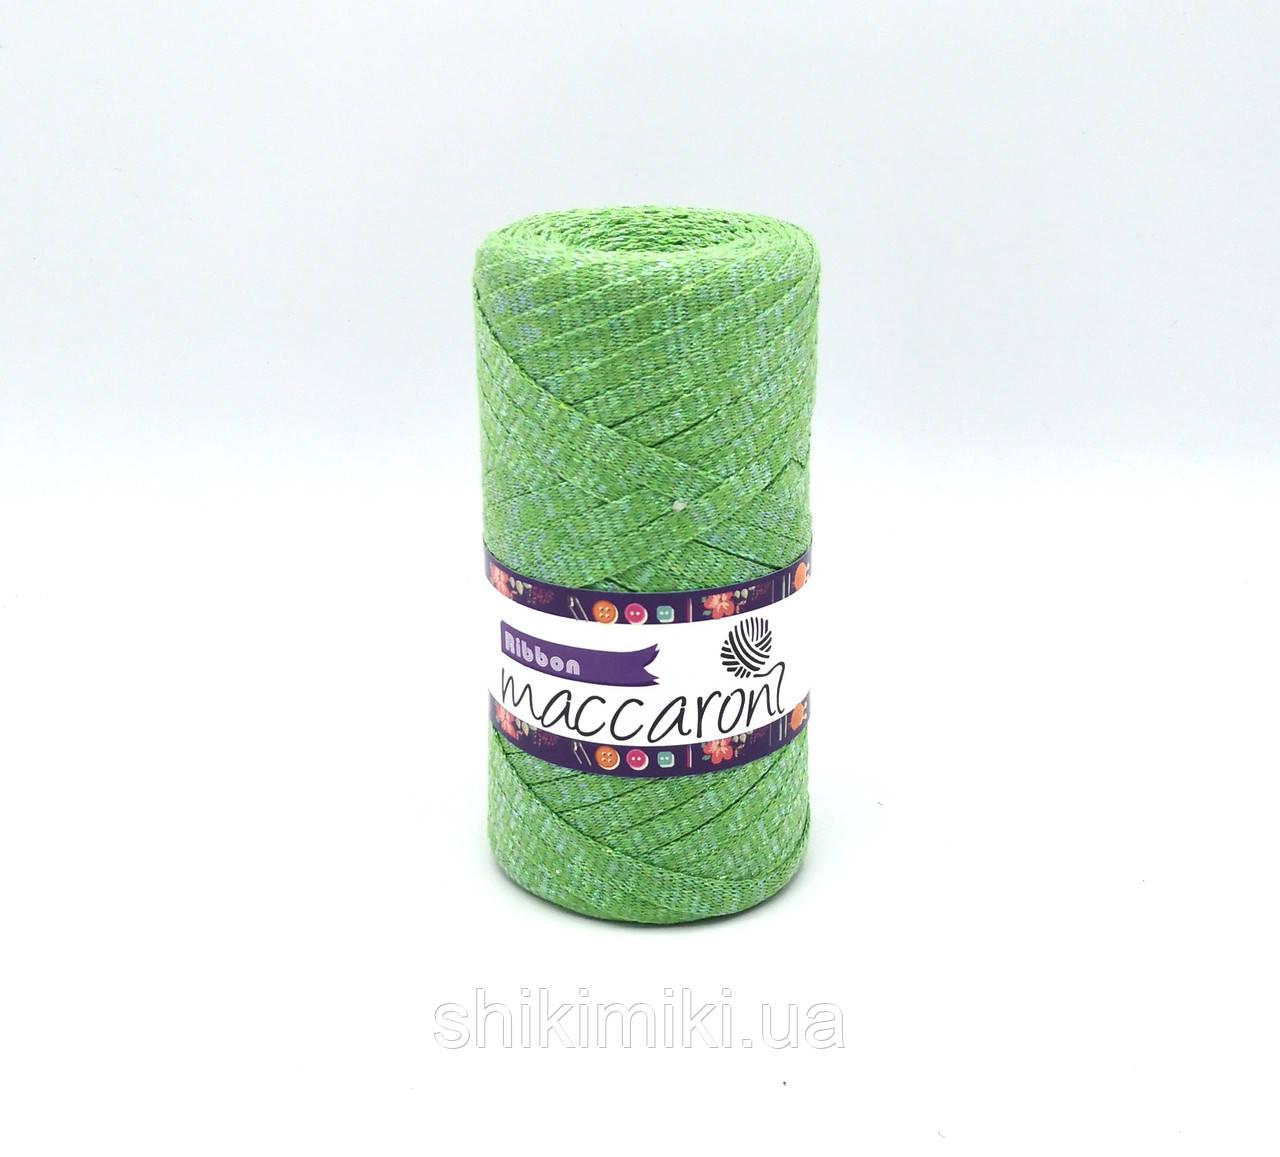 Трикотажный плоский шнур Ribbon Glitter, цвет Зеленое яблоко